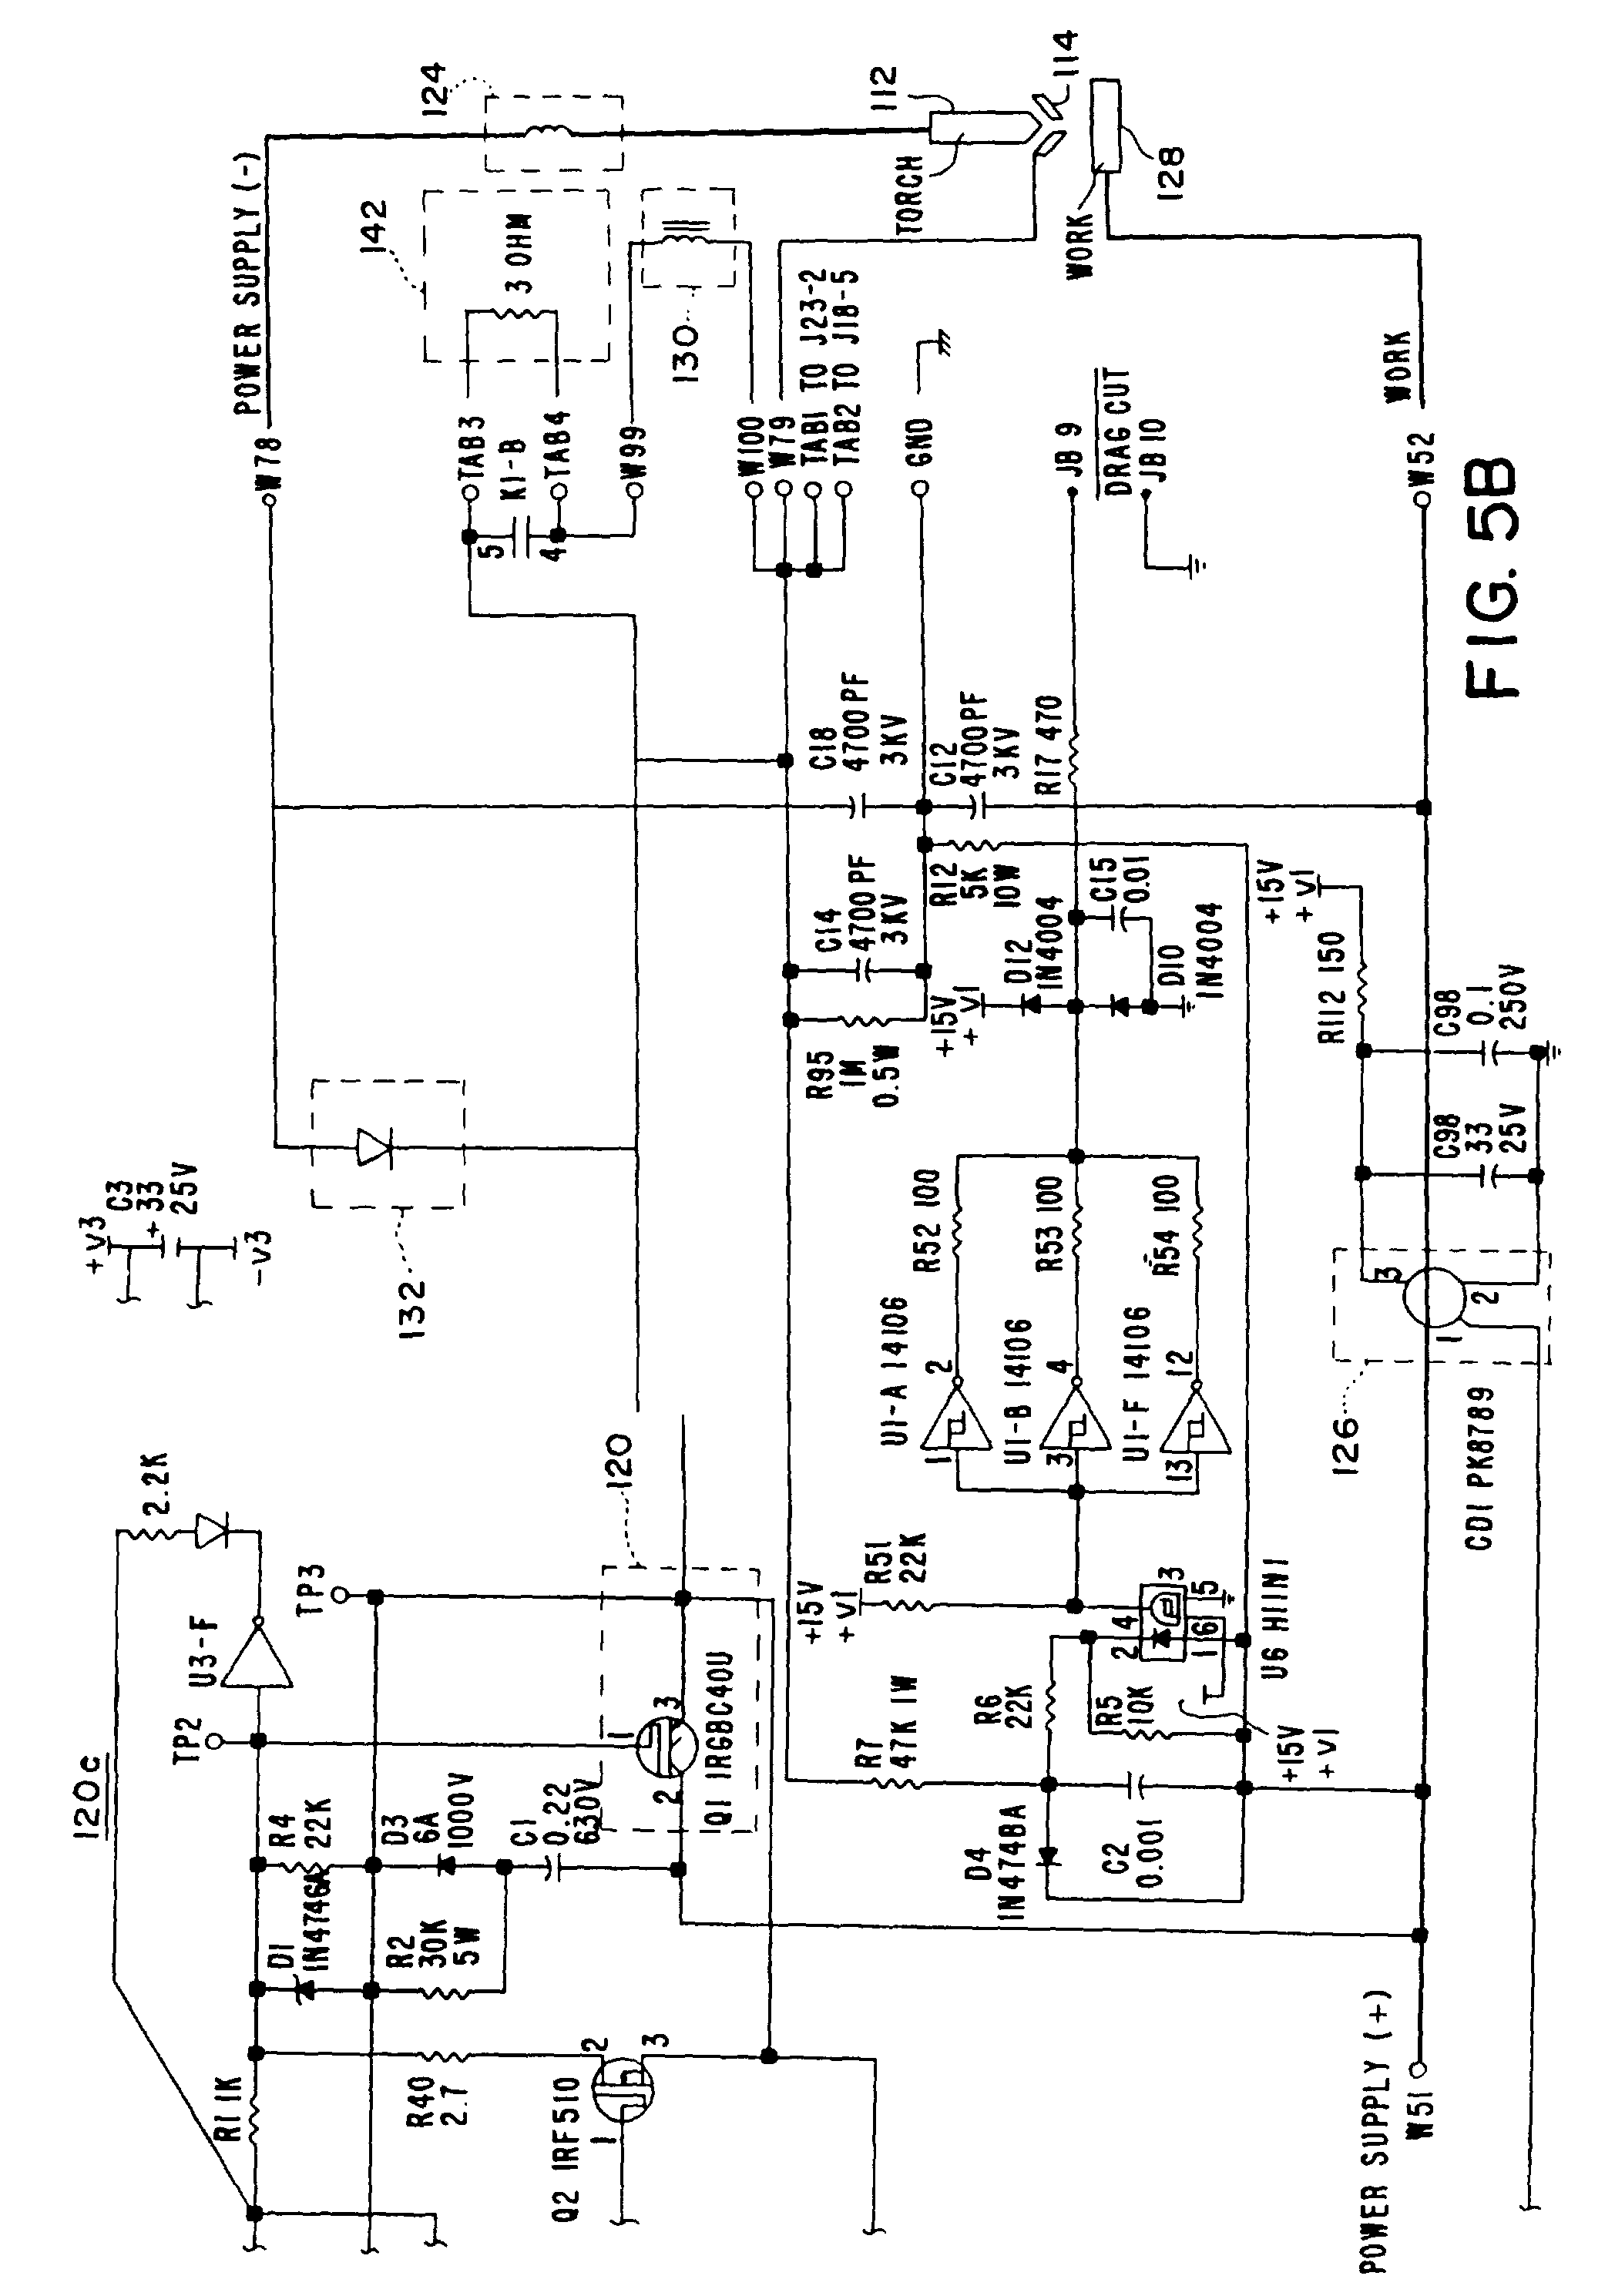 Wiring Diagram For Gfci Circuit moreover 2006 Dodge Durango Wiring Diagrams also 2003 Isuzu Npr Box Truck Heater Wiring Diagram together with Main Bearing Torque Specs On A 2002 Dodge Dakota 4 7 further Plasma Cutter Wiring Schematic. on 2005 dodge viper wiring diagrams